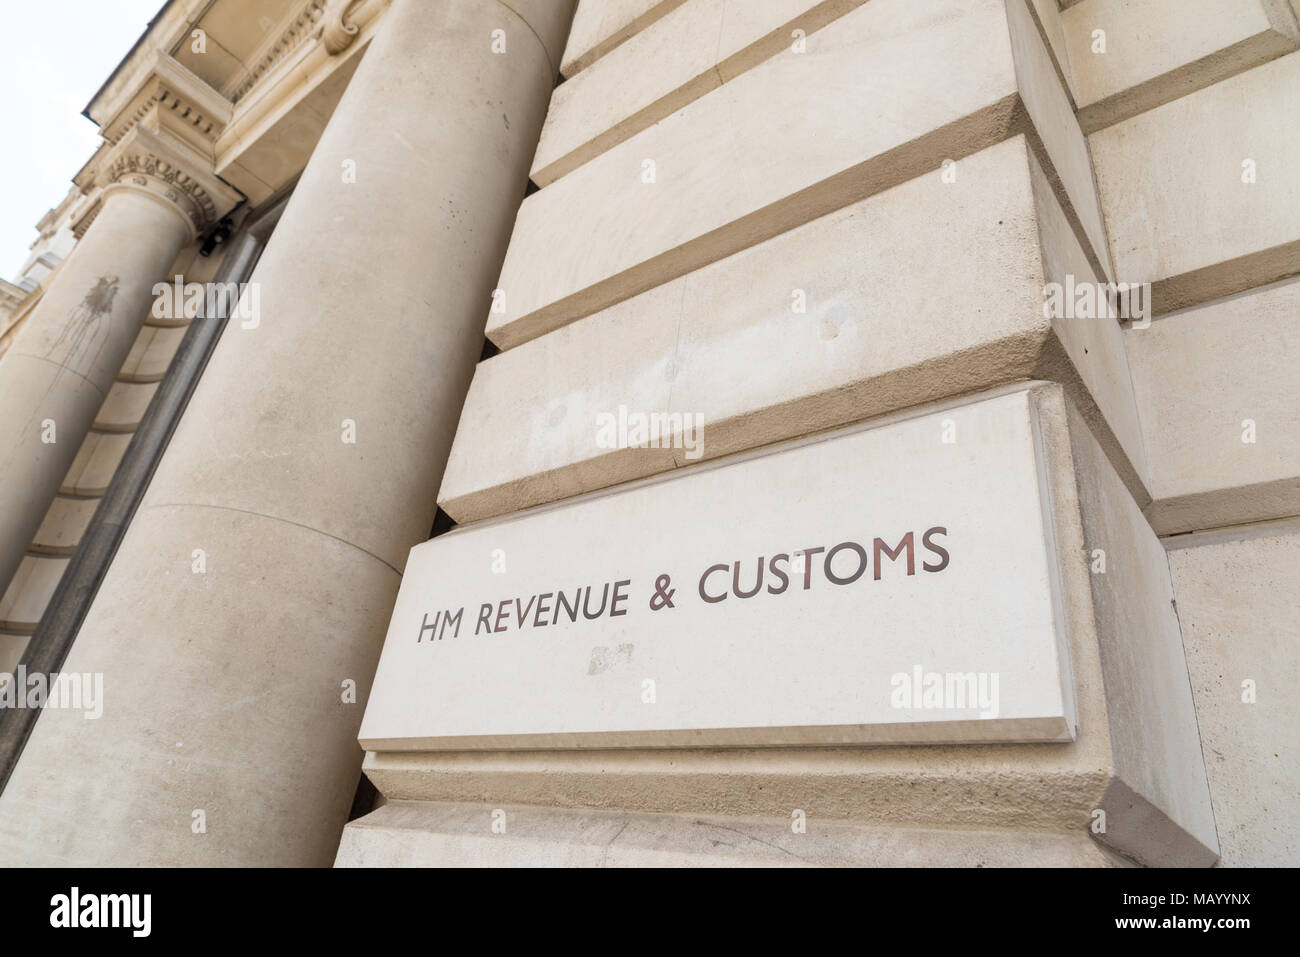 HM Revenue and Customs, Whitehall, London, UK - Stock Image